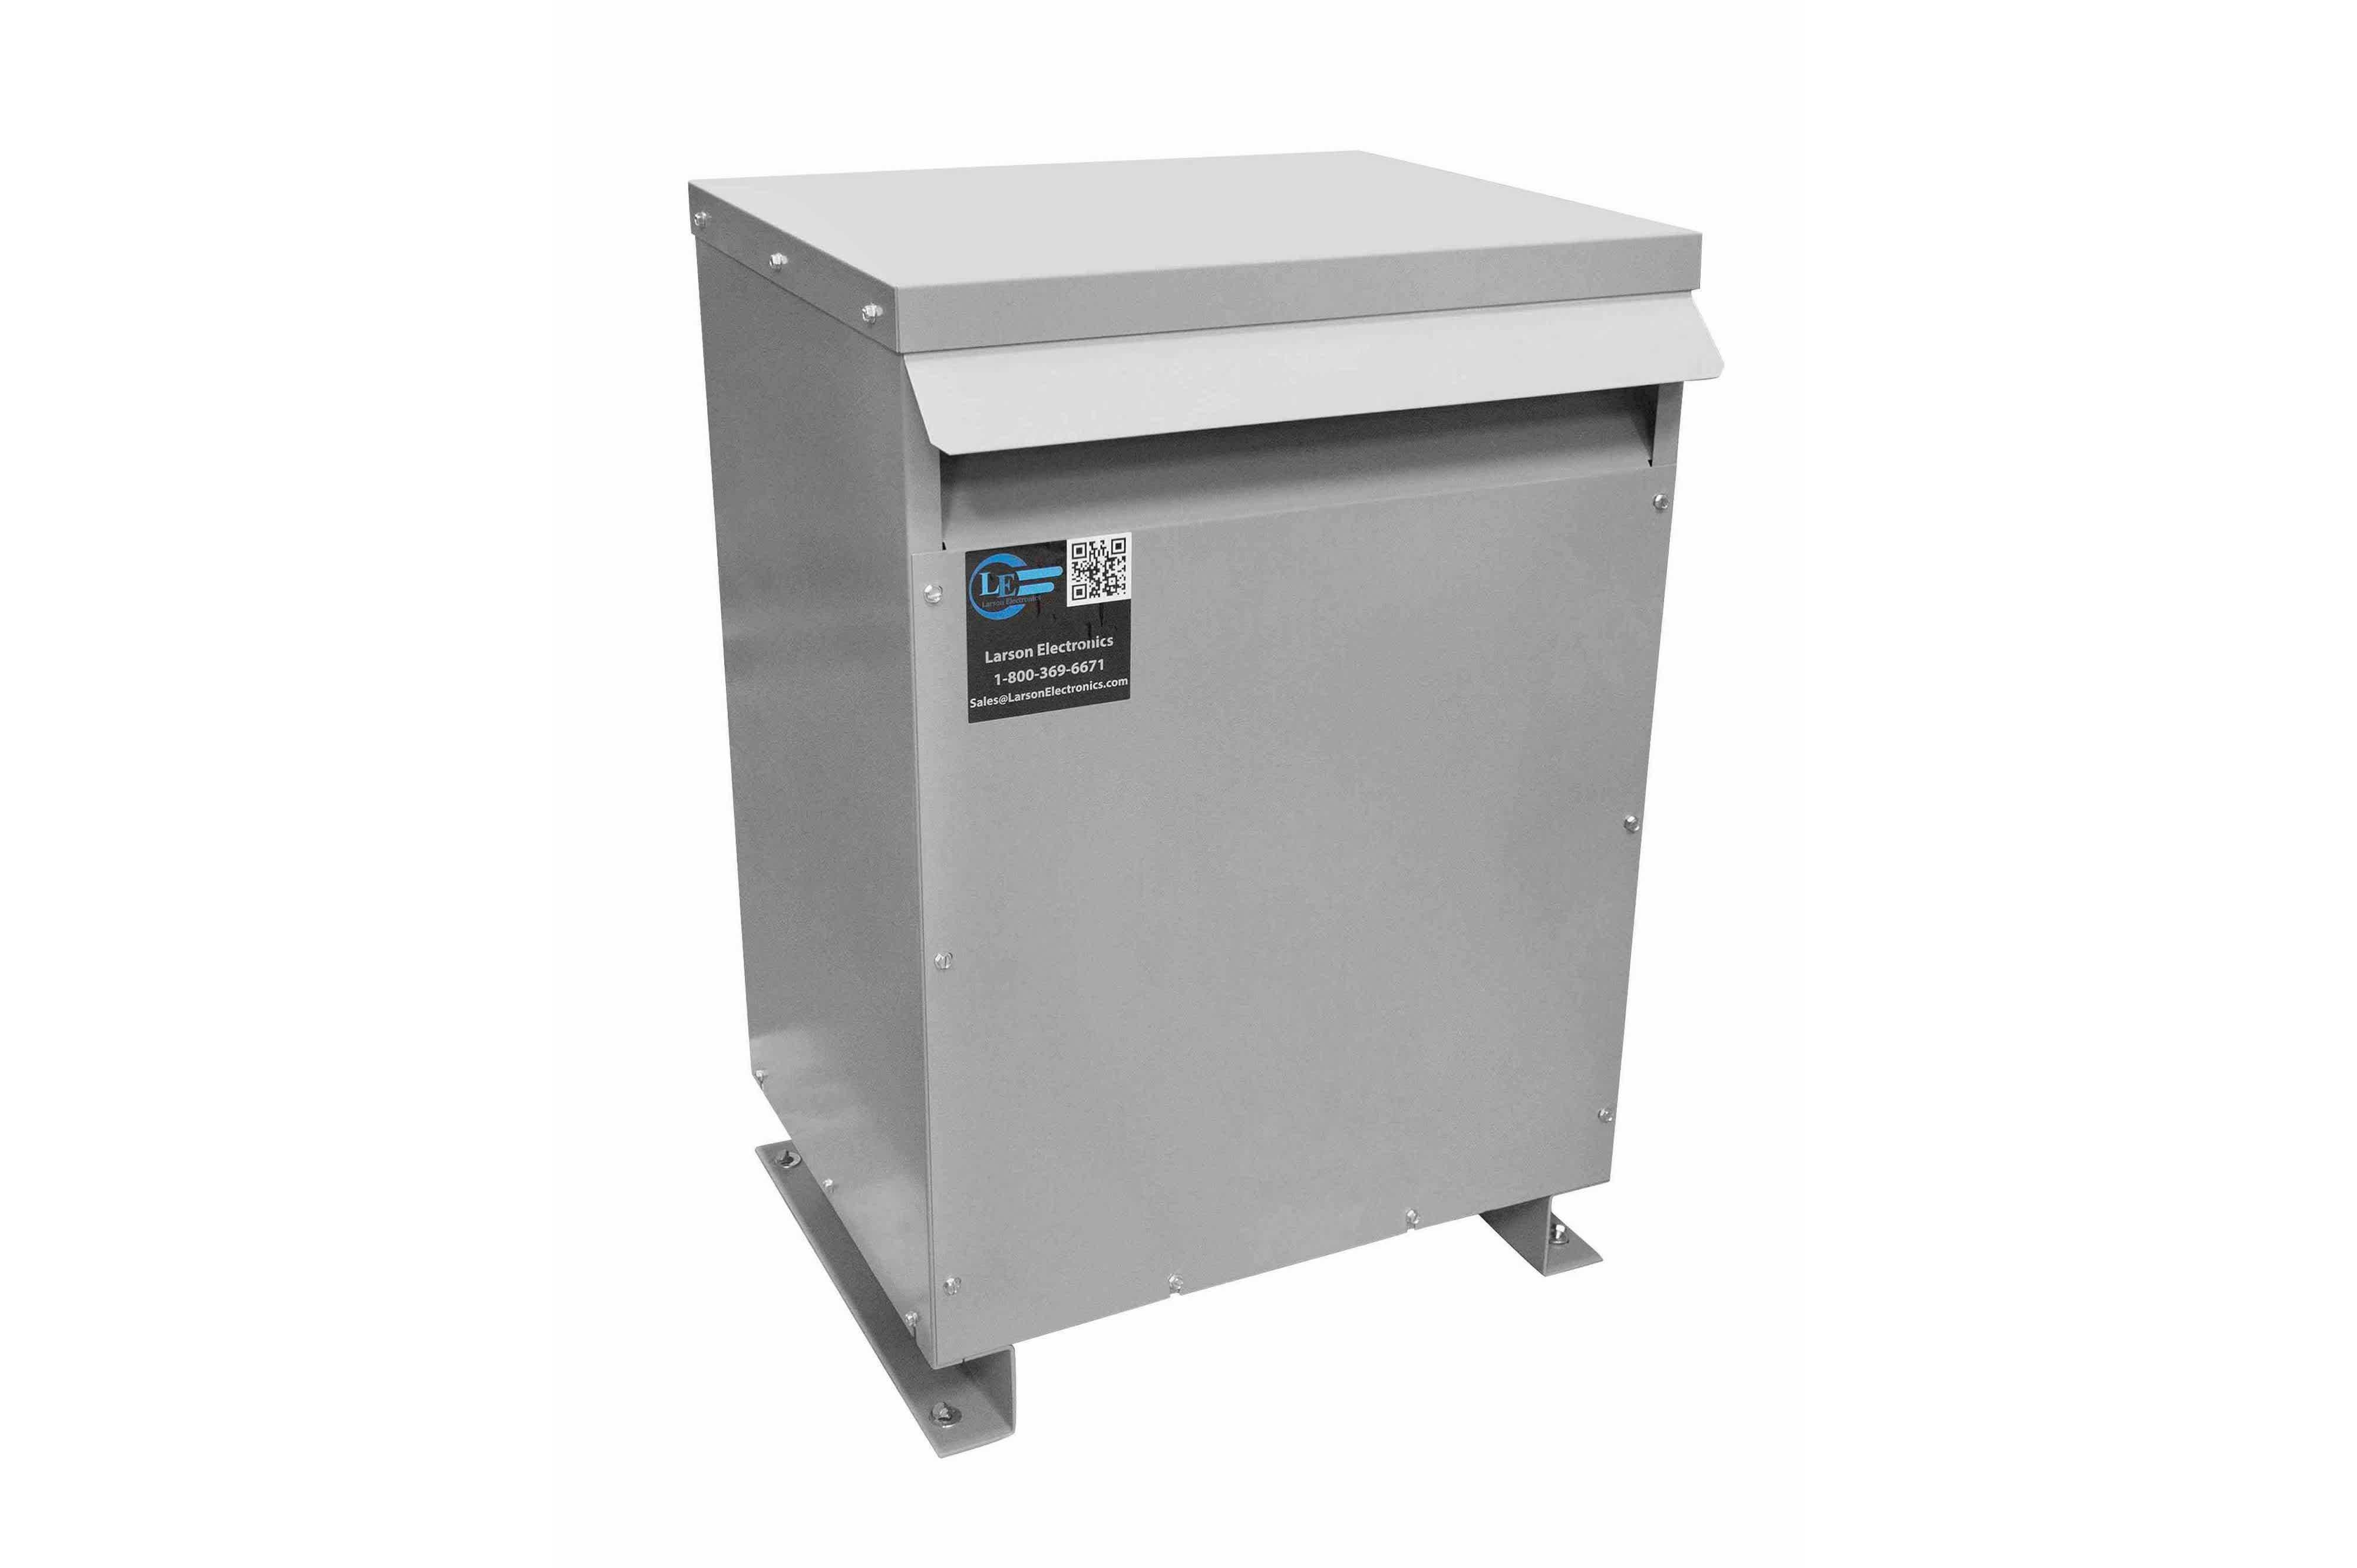 250 kVA 3PH Isolation Transformer, 208V Wye Primary, 380Y/220 Wye-N Secondary, N3R, Ventilated, 60 Hz